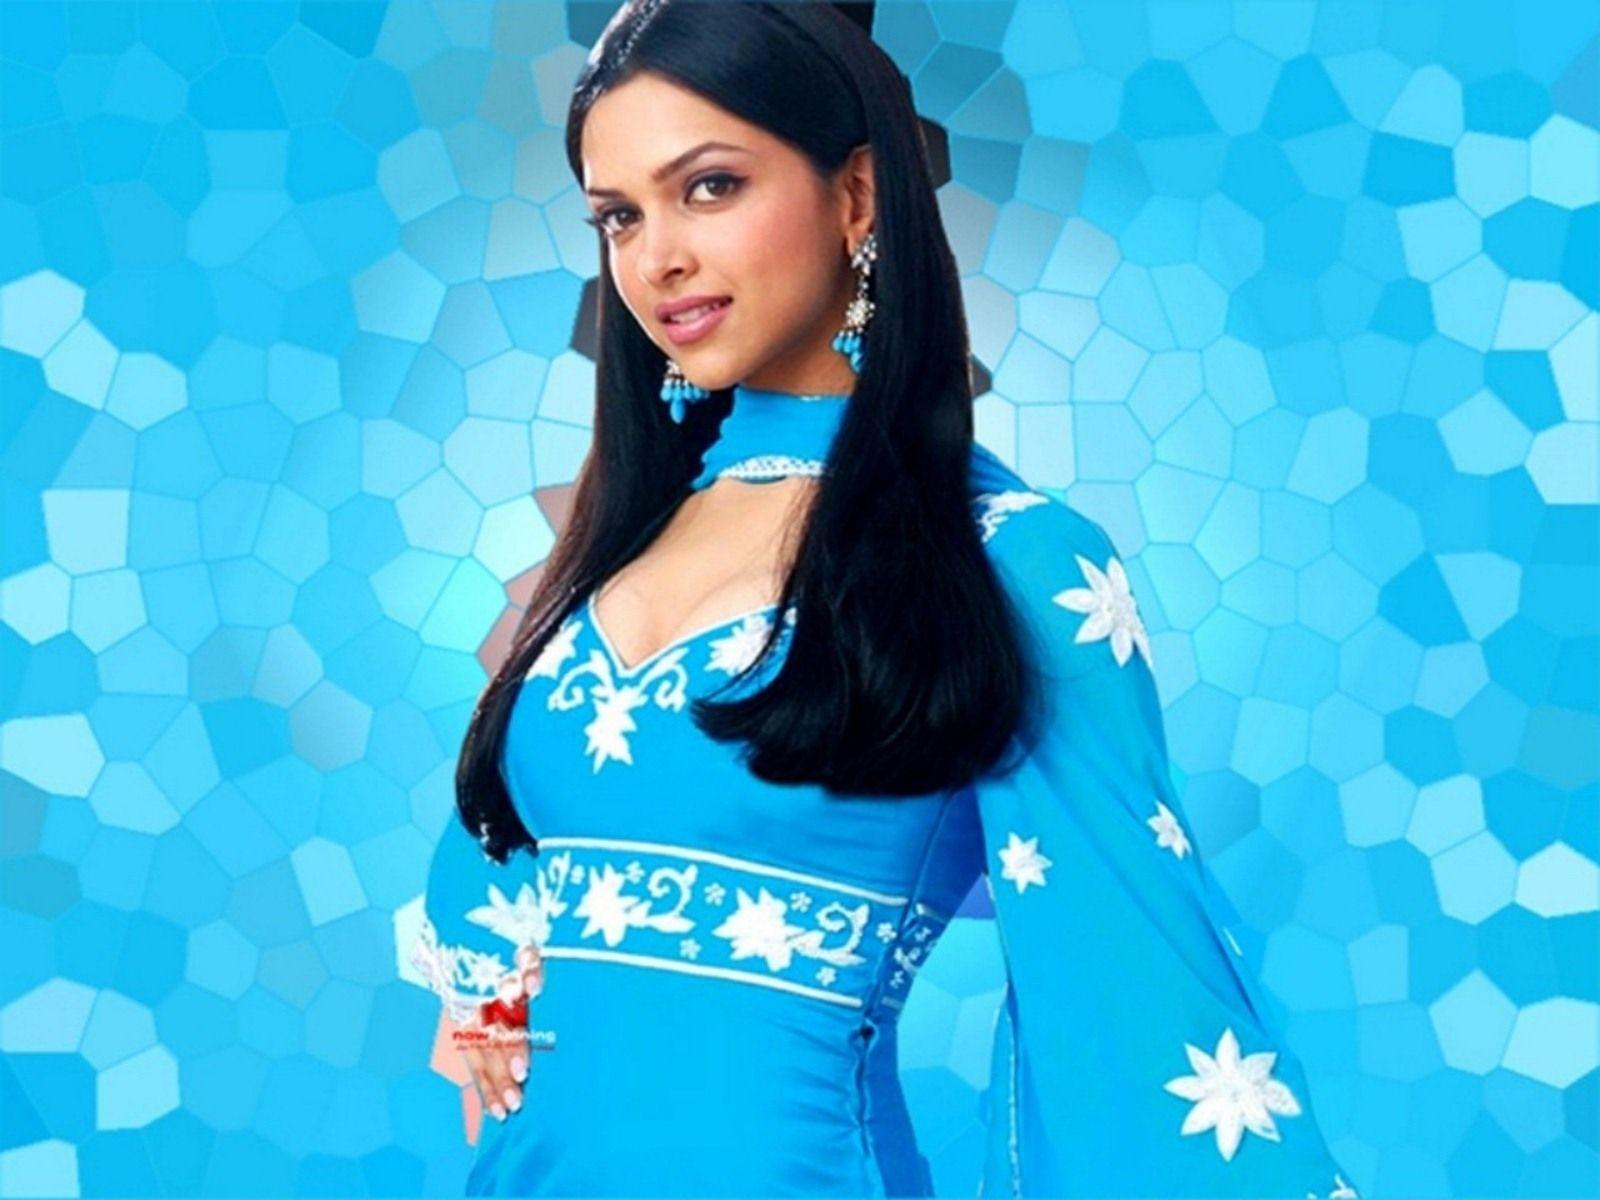 Sweet Deepika Padukone Blue Dress 1600x1200 246510 Bollywood Dress Deepika Padukone Bollywood Hairstyles